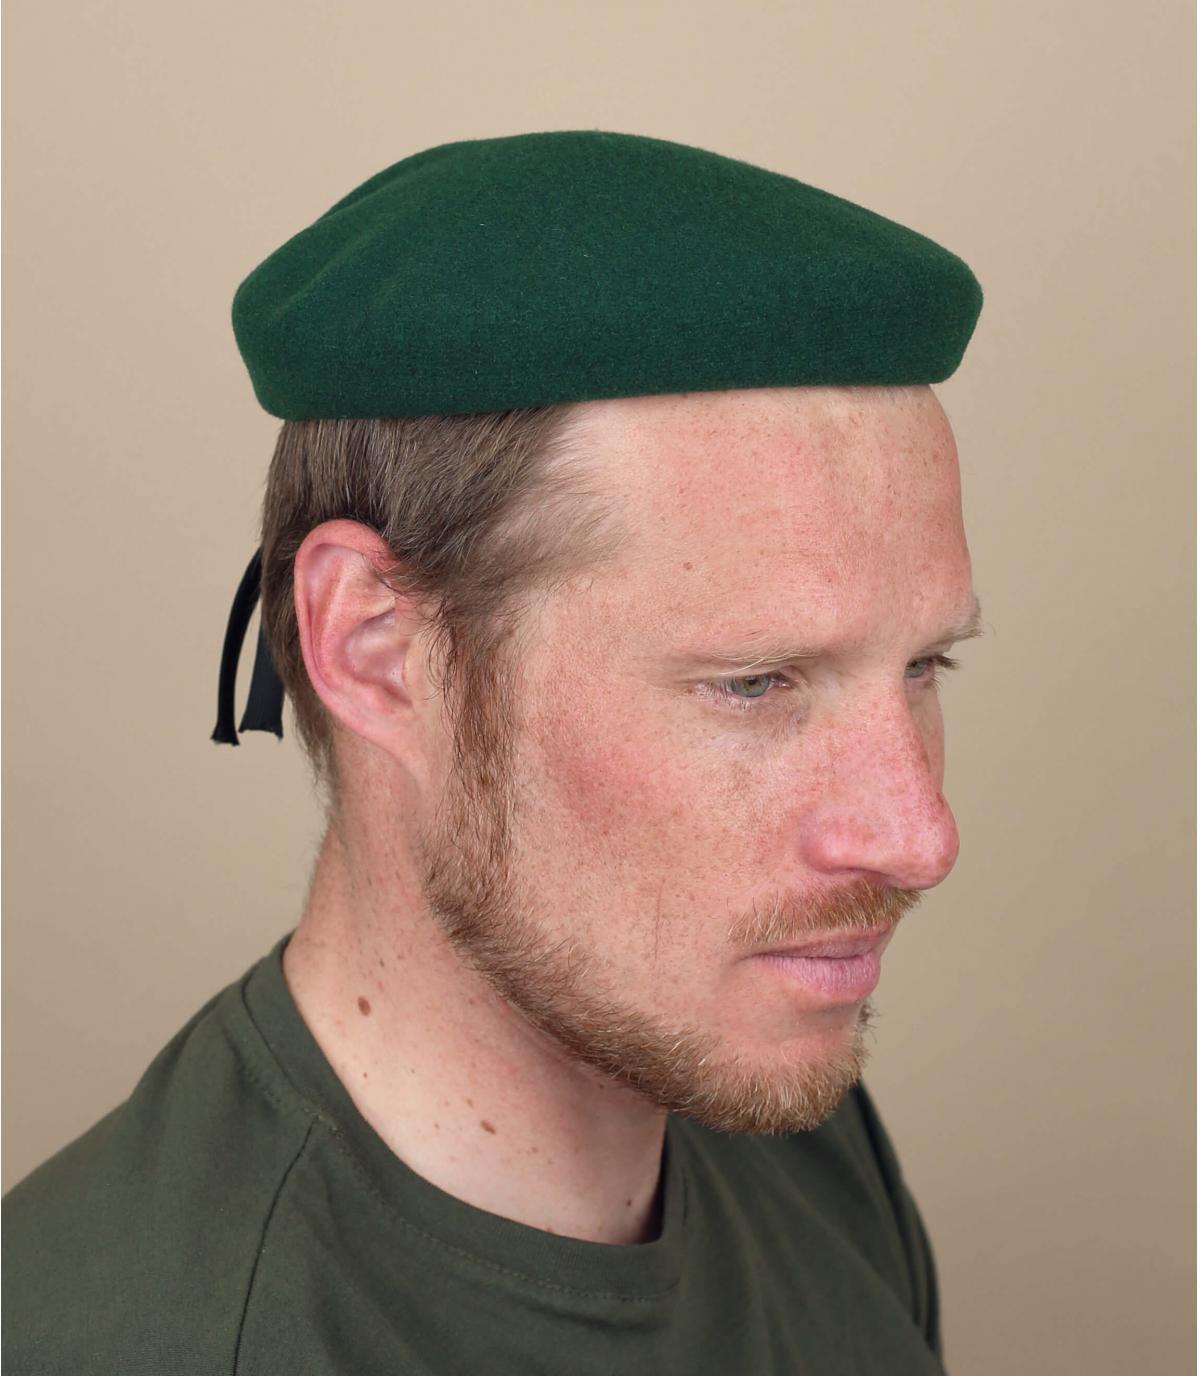 Groene legioen commando baret